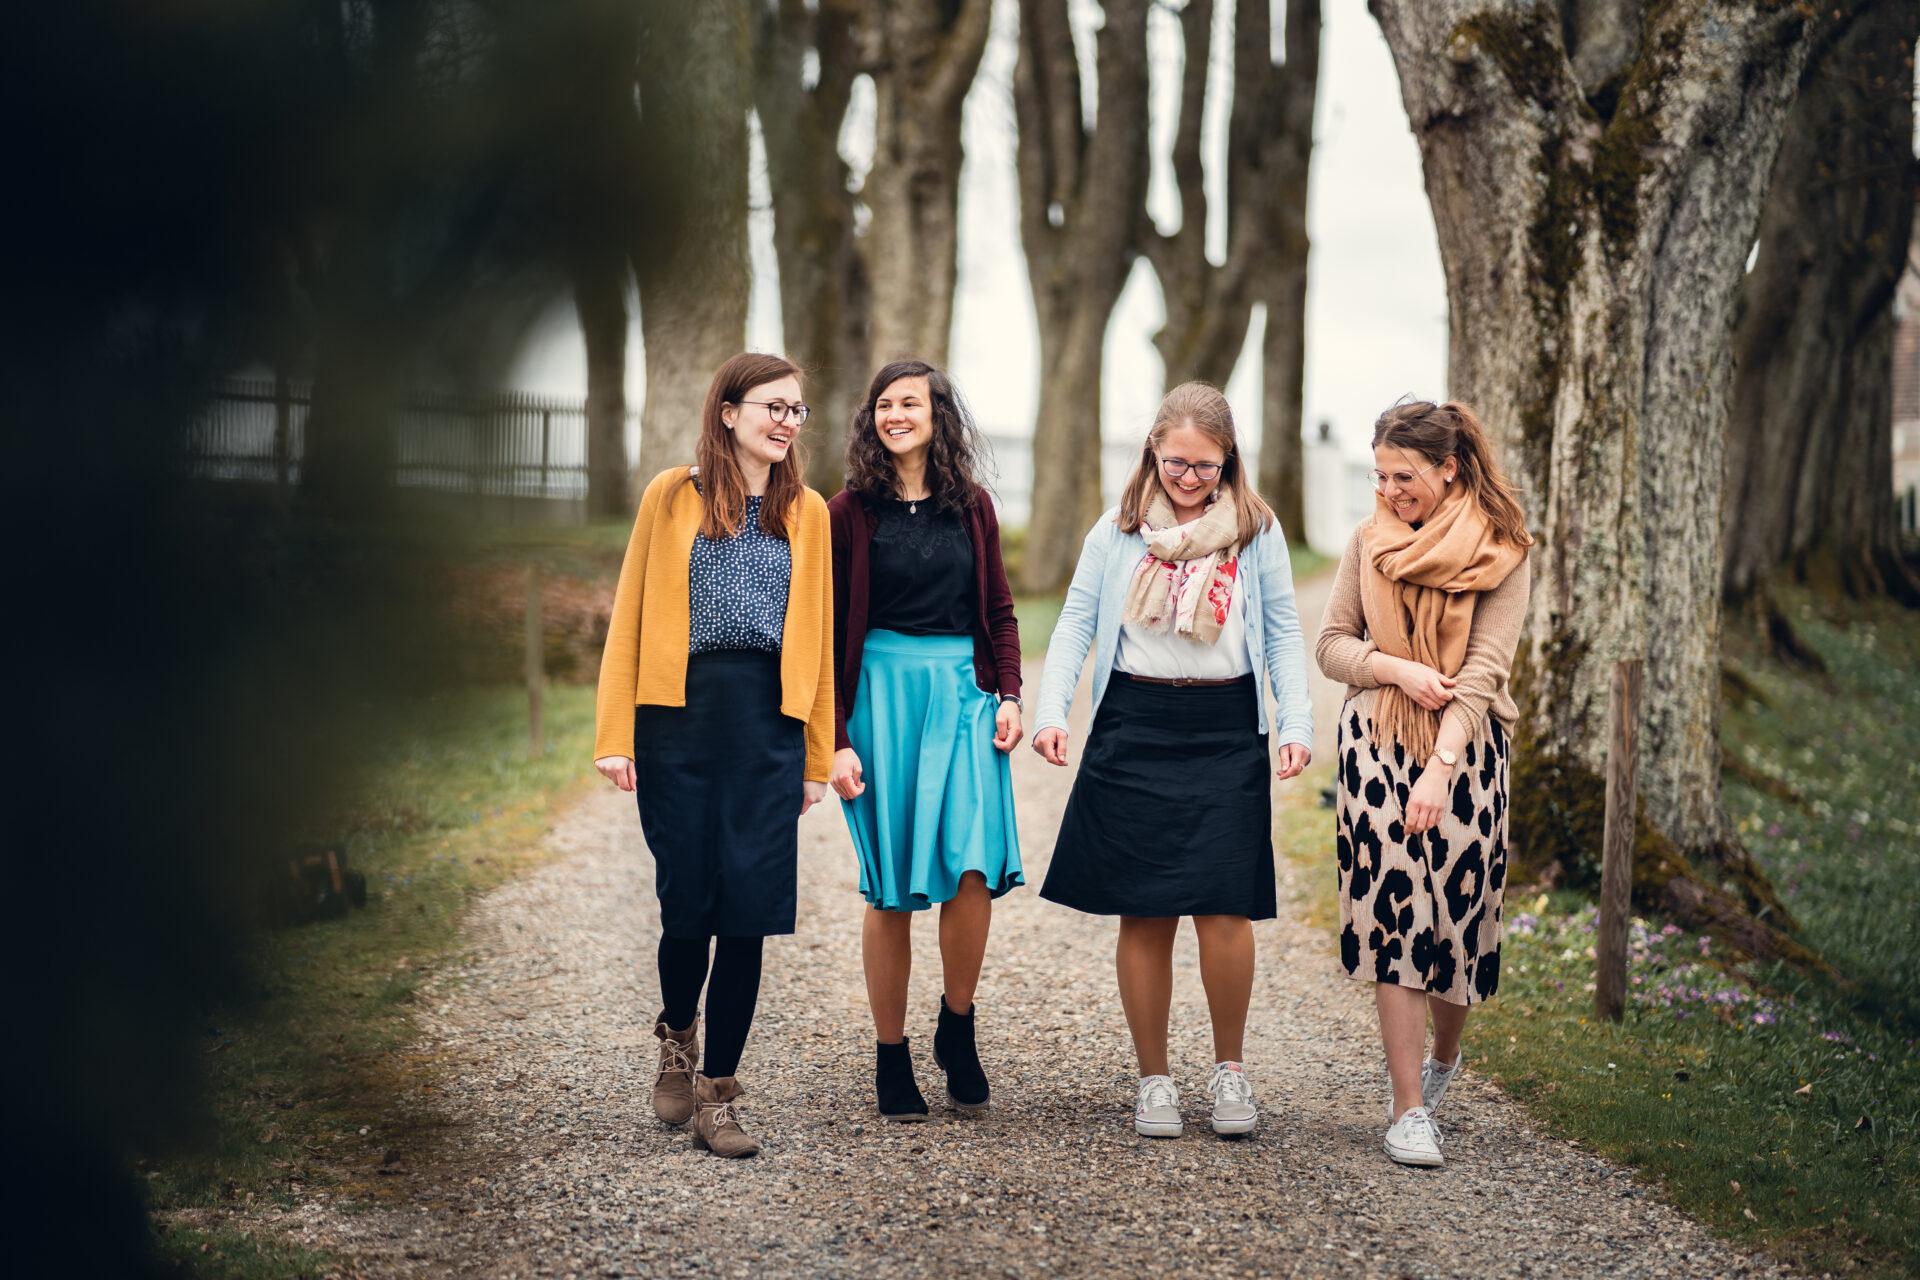 Gruppen der KJB: KJB Mädchen lachen zusammen